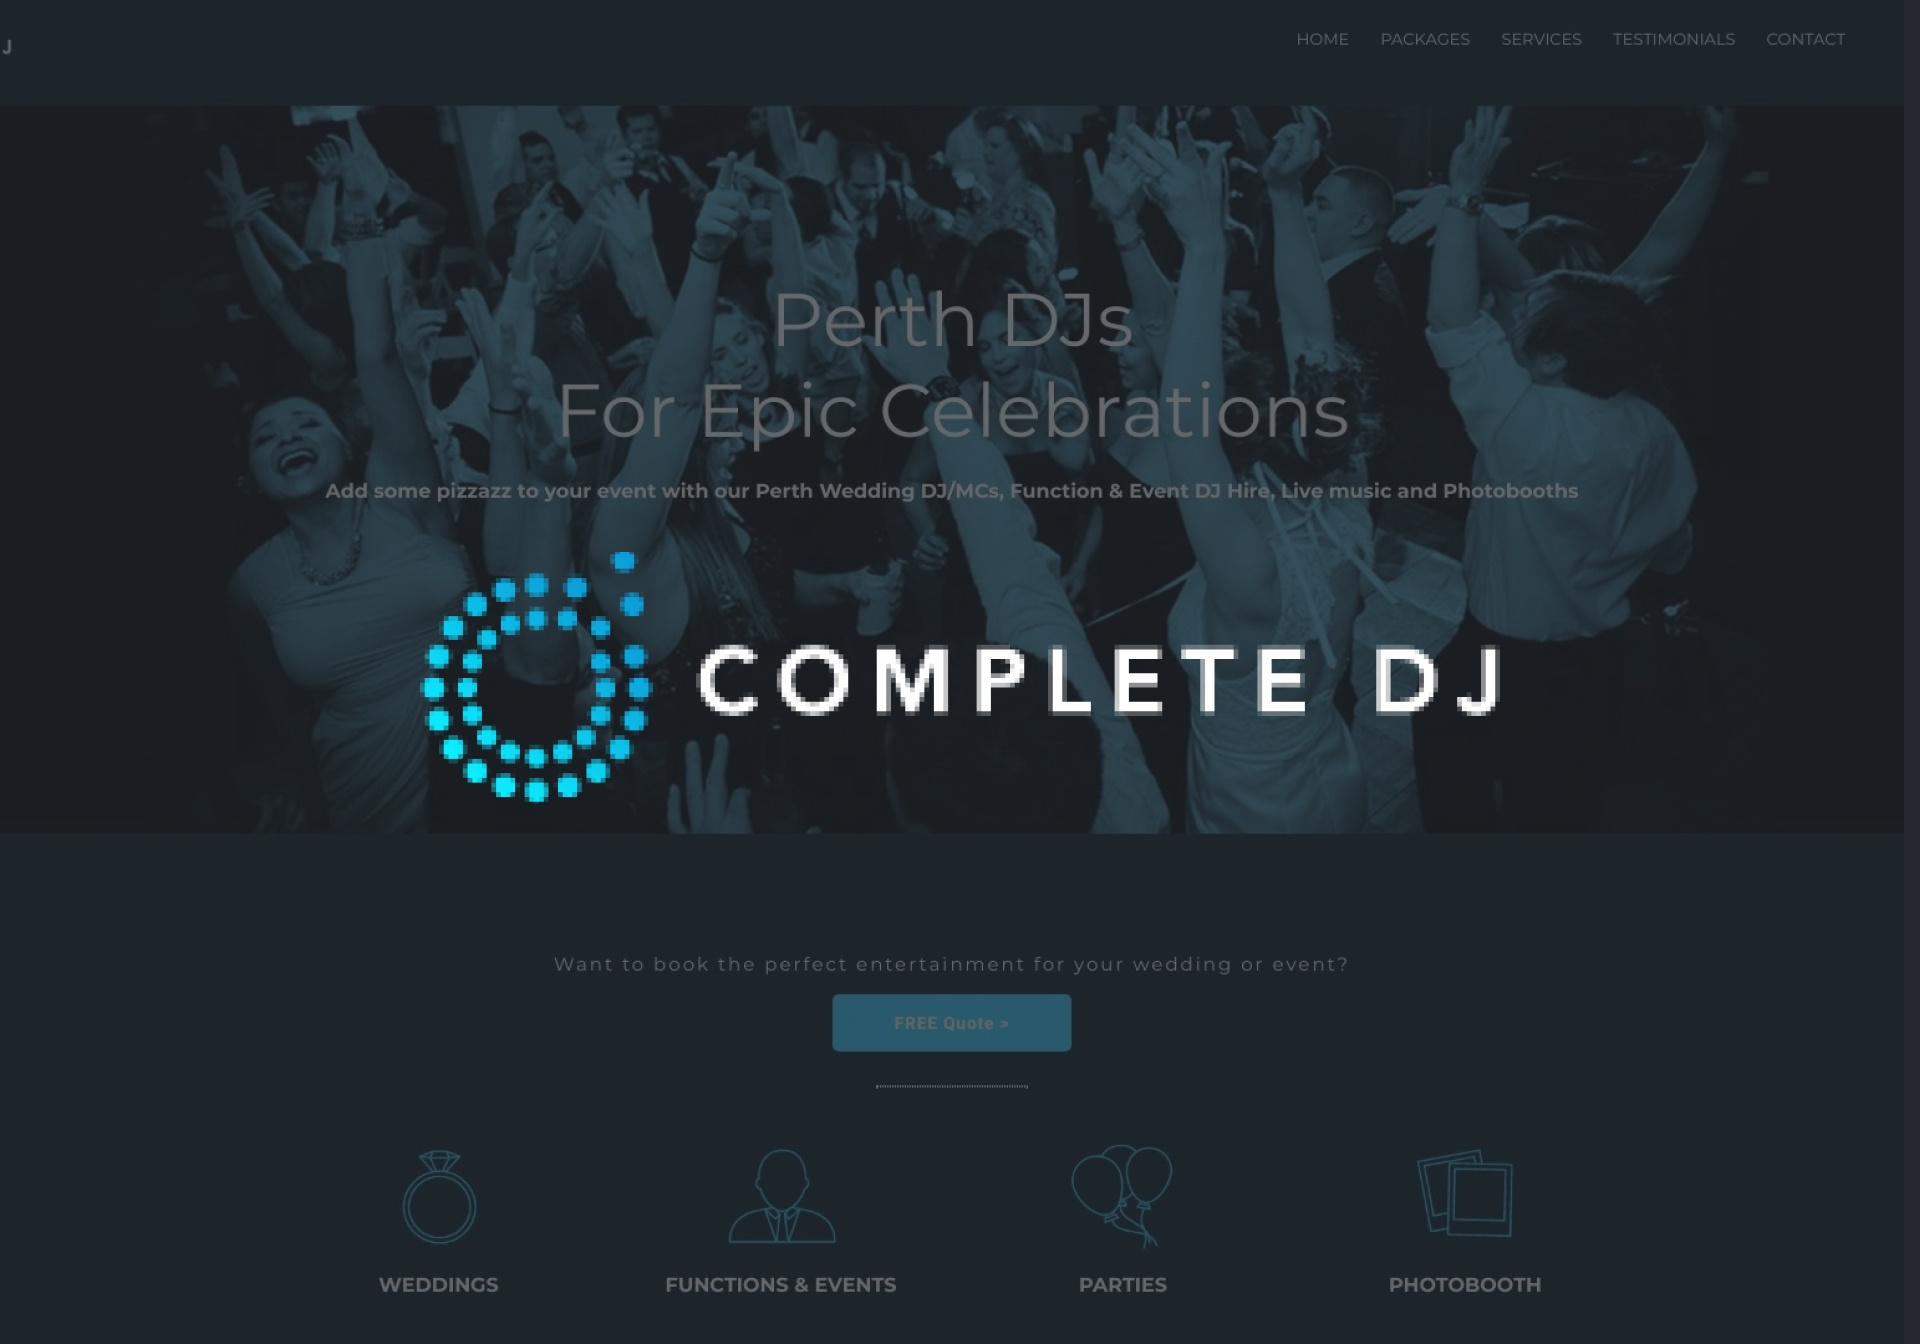 Complete DJ Group